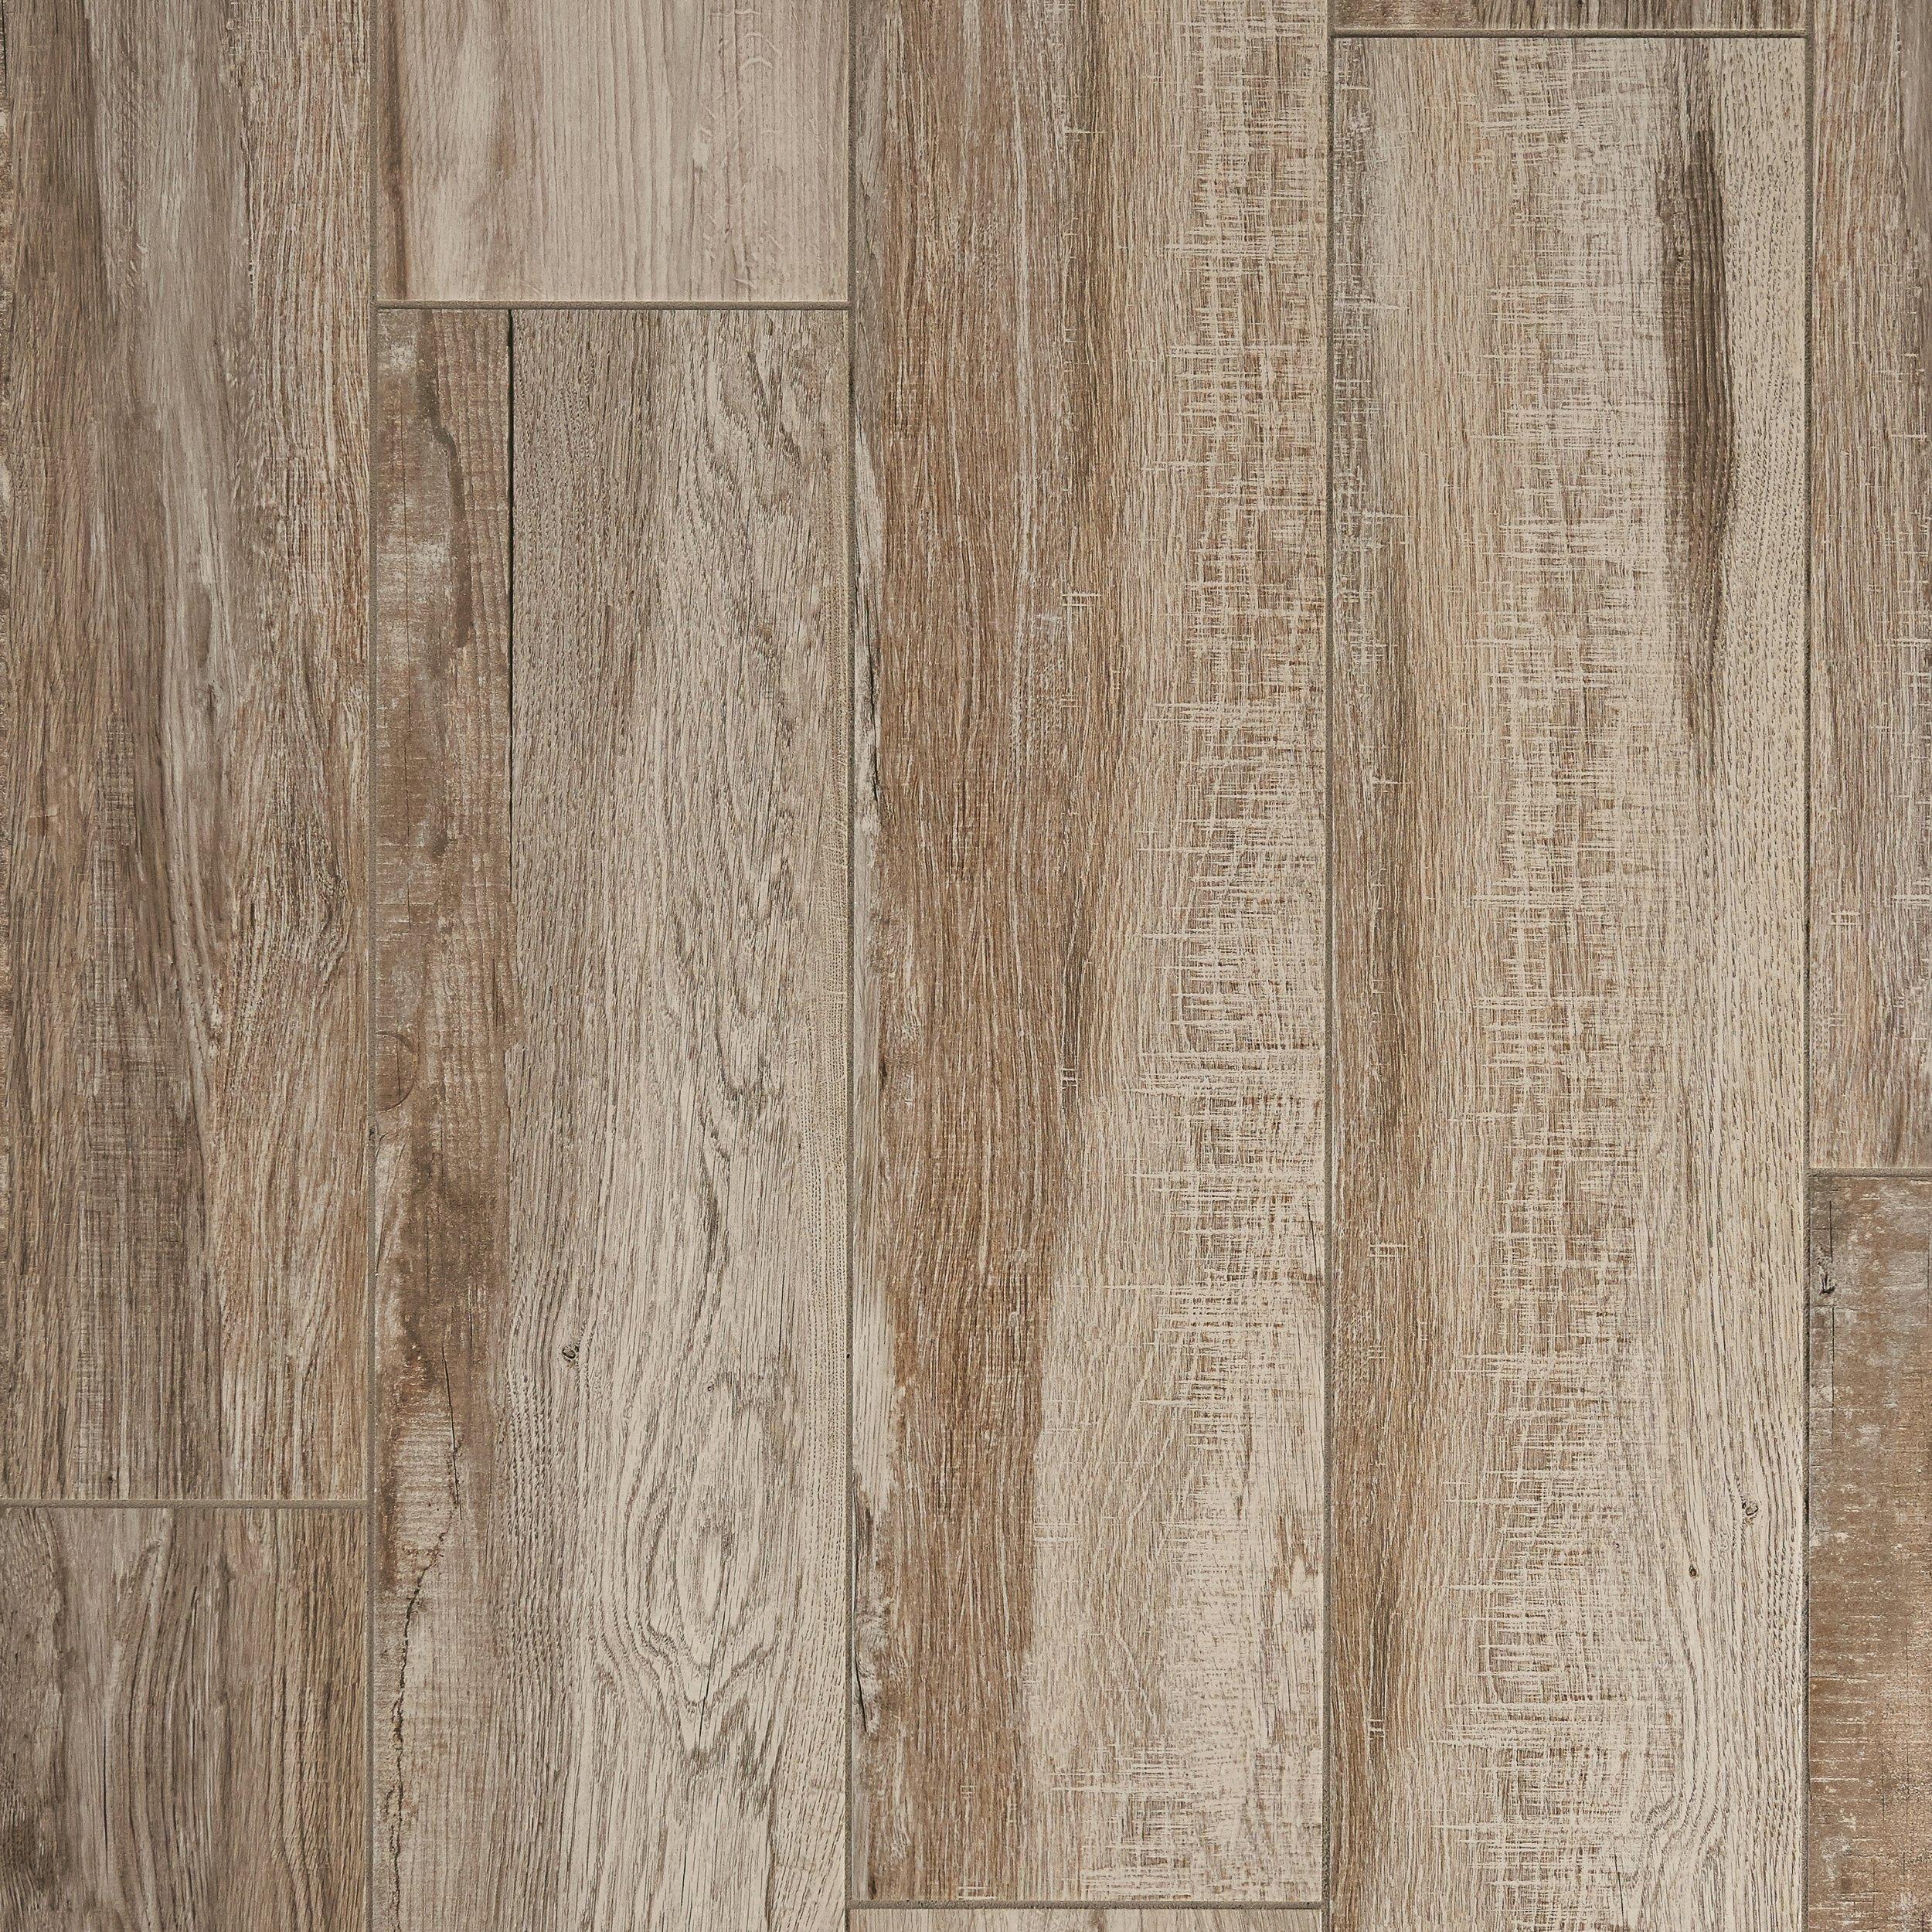 New Kent Gray Wood Plank Ceramic Tile Interiors Flooring